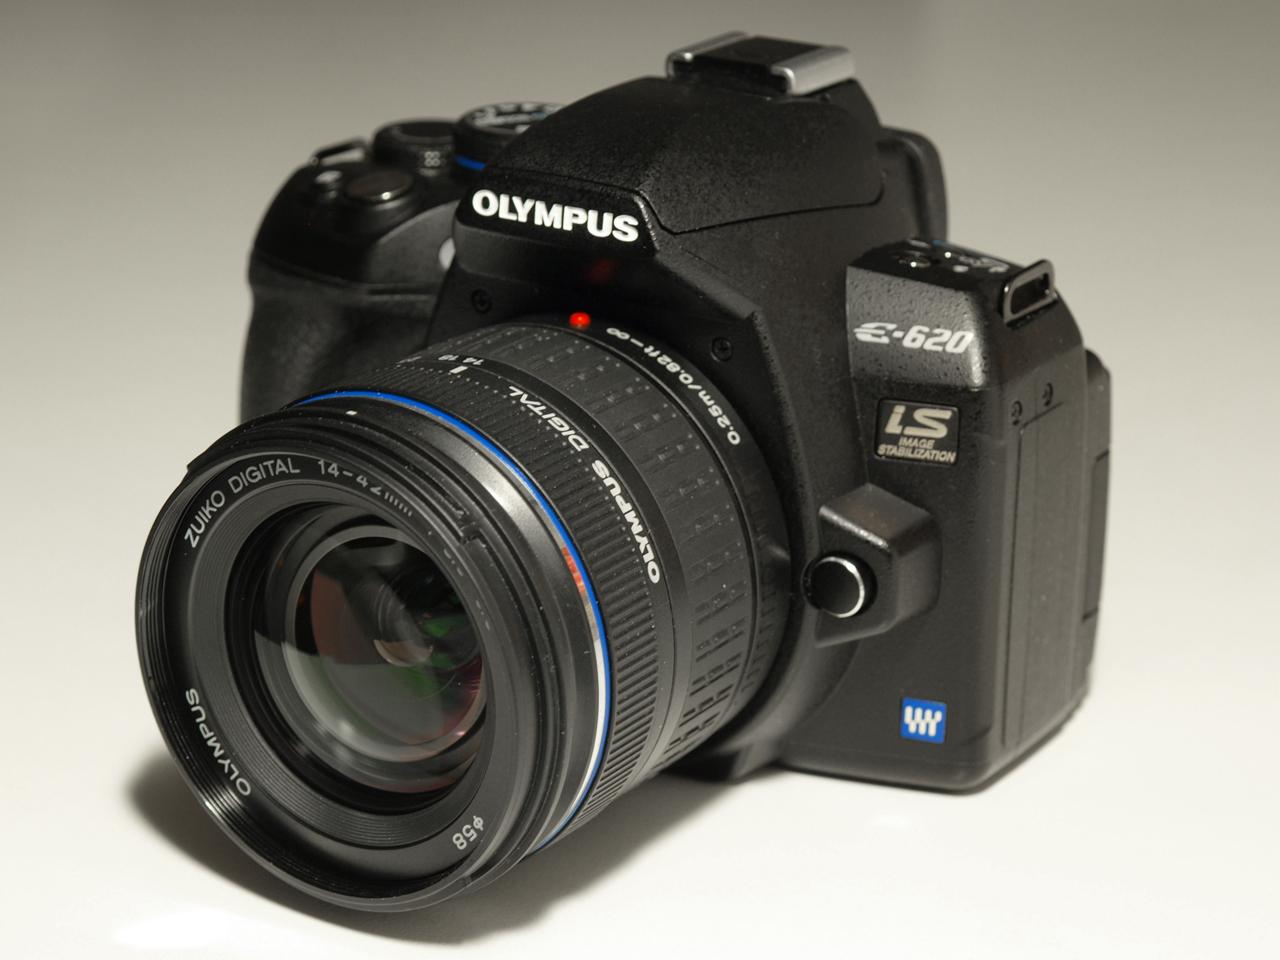 File Olympus E-620 jpg...